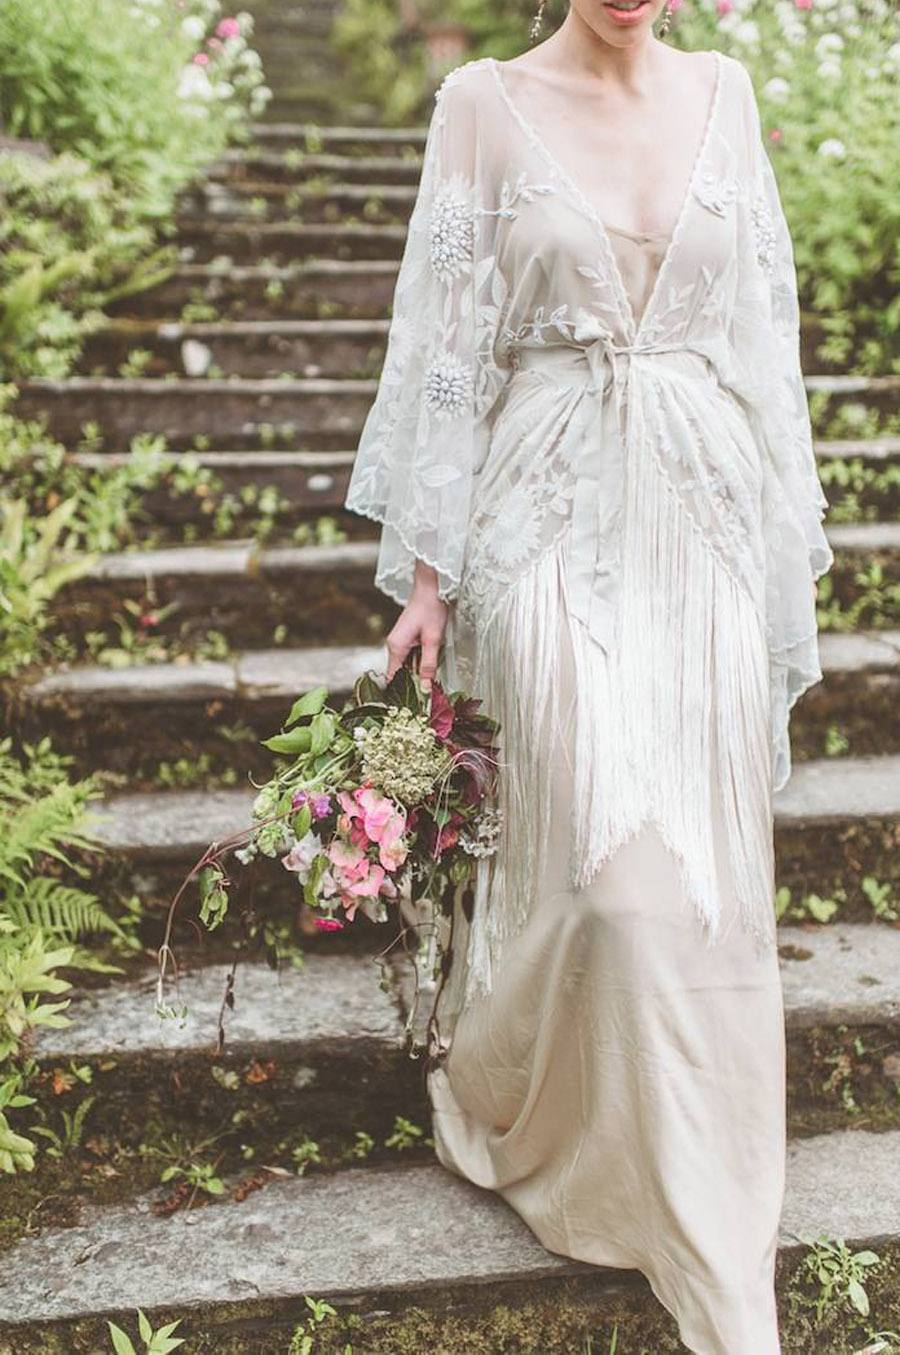 VESTIDOS DE NOVIA CON FLECOS vestidos-flecos-novia